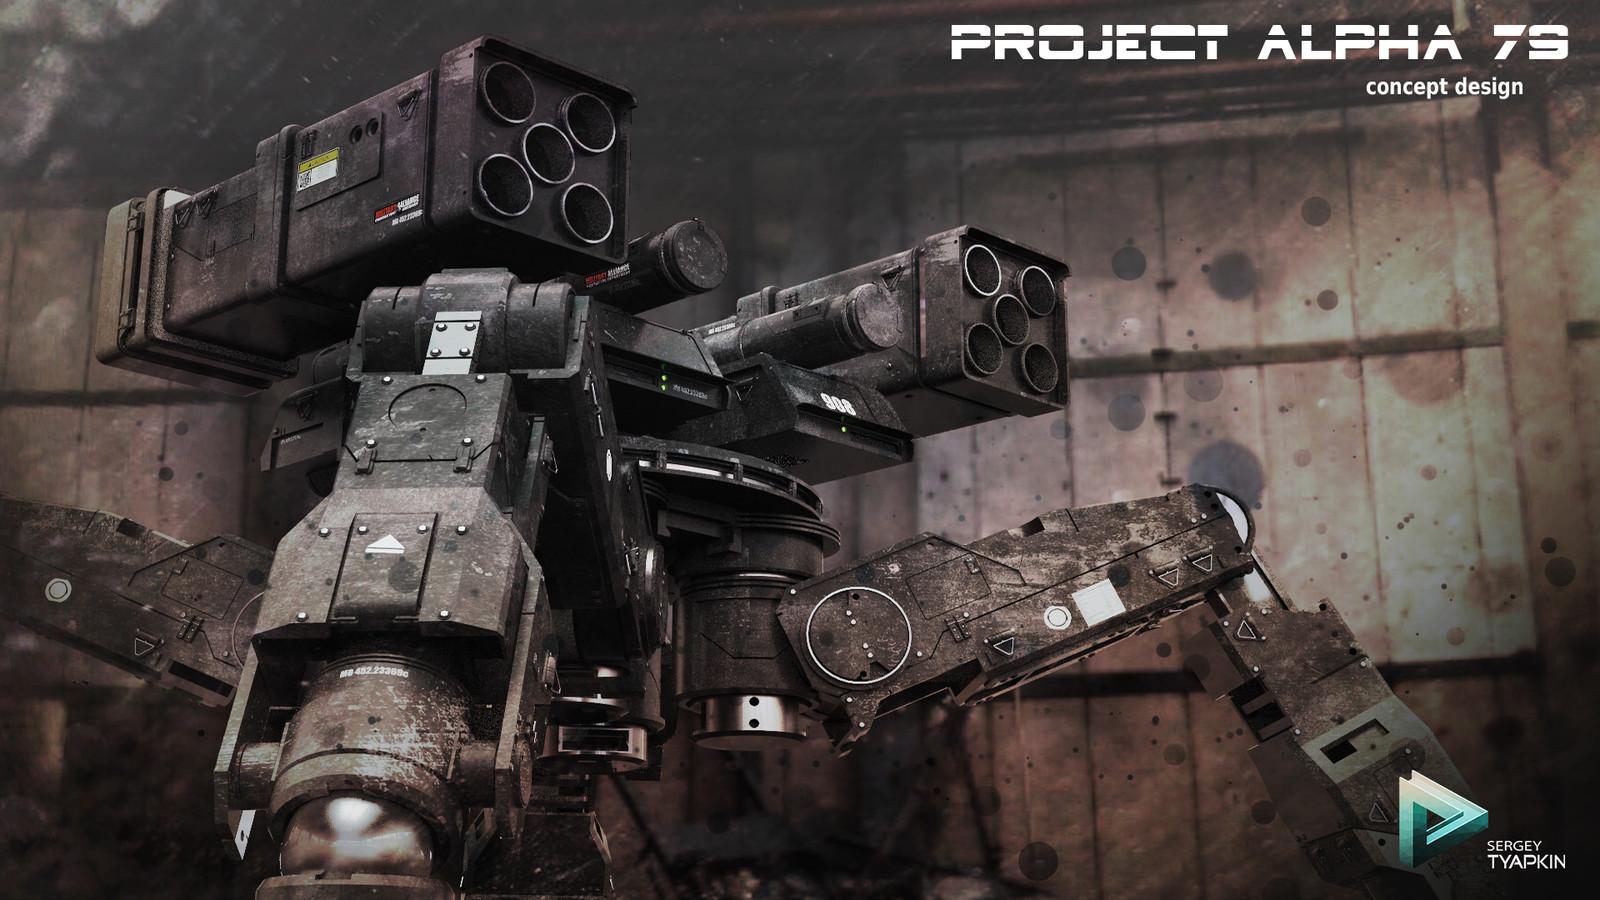 Project Alpha 79